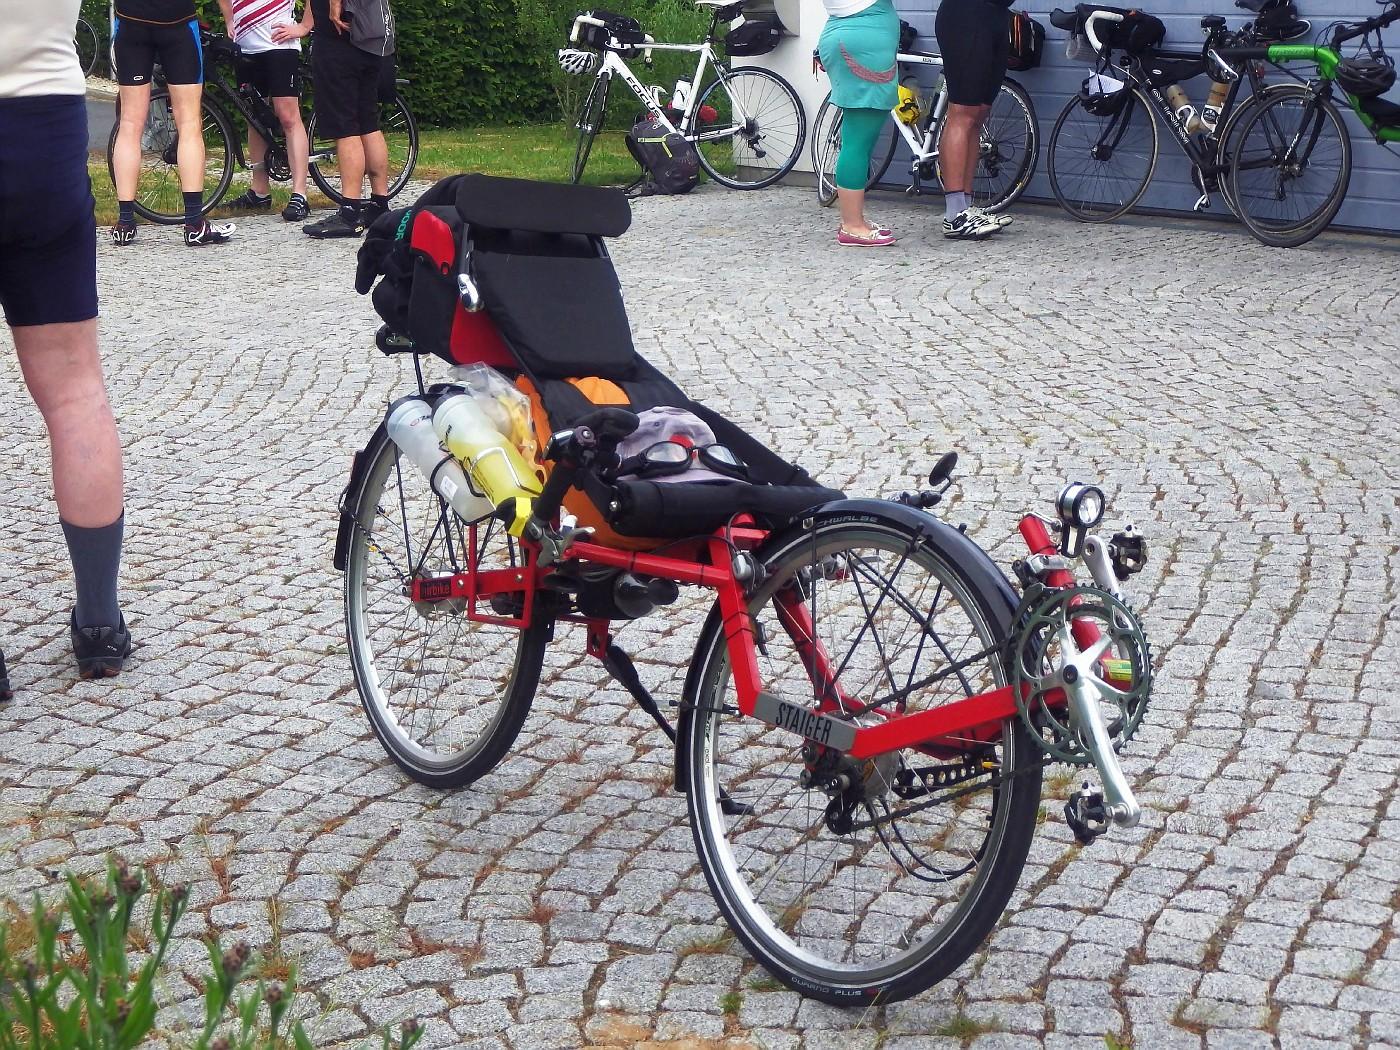 Staiger Airbike